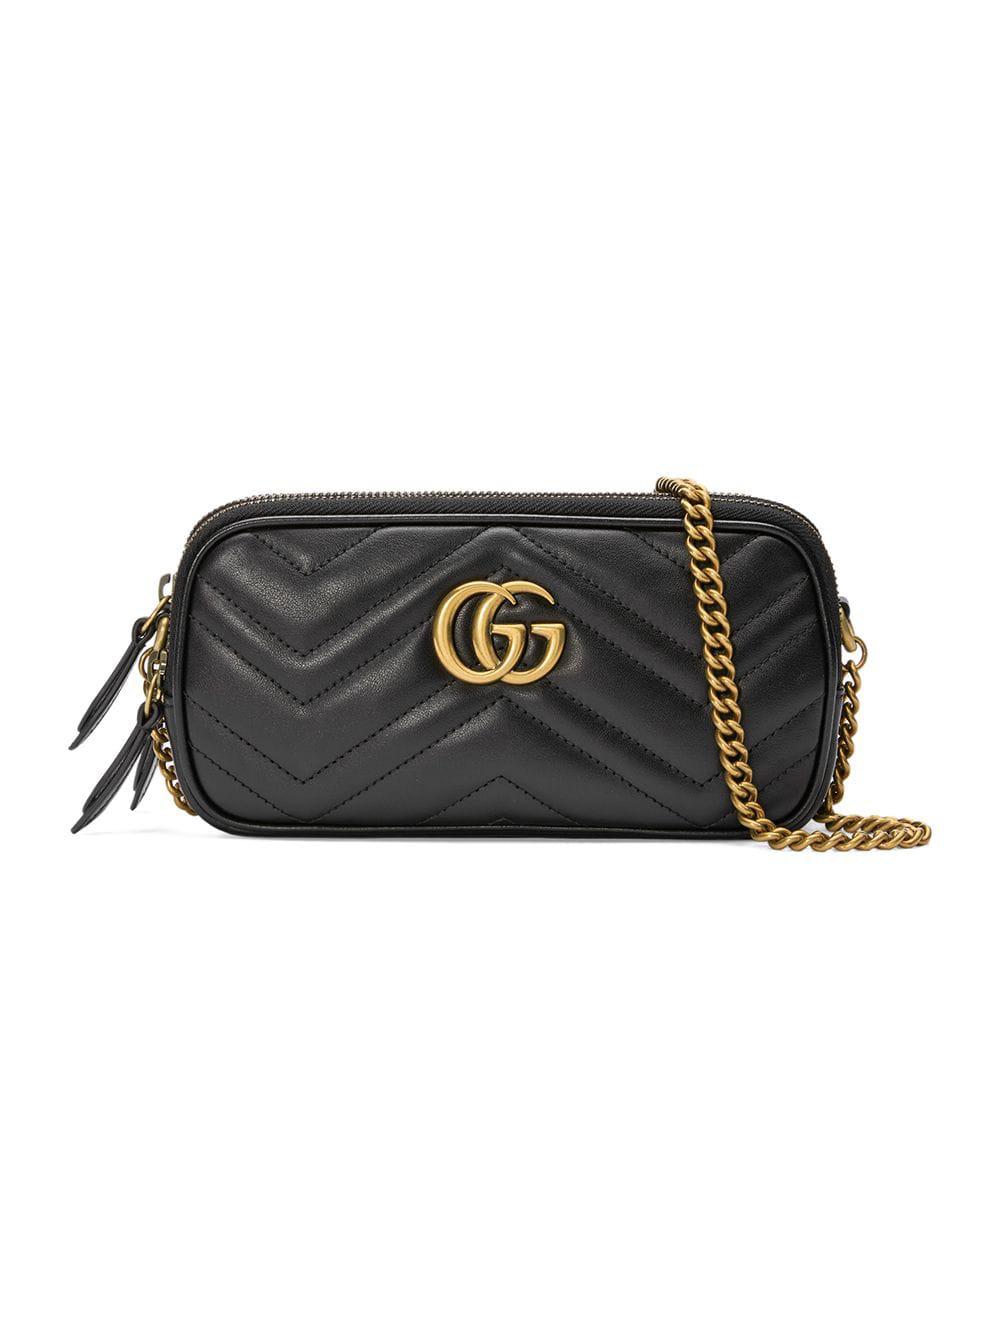 a02bbb34981 Gucci Gg Marmont Mini Chain Bag - Black